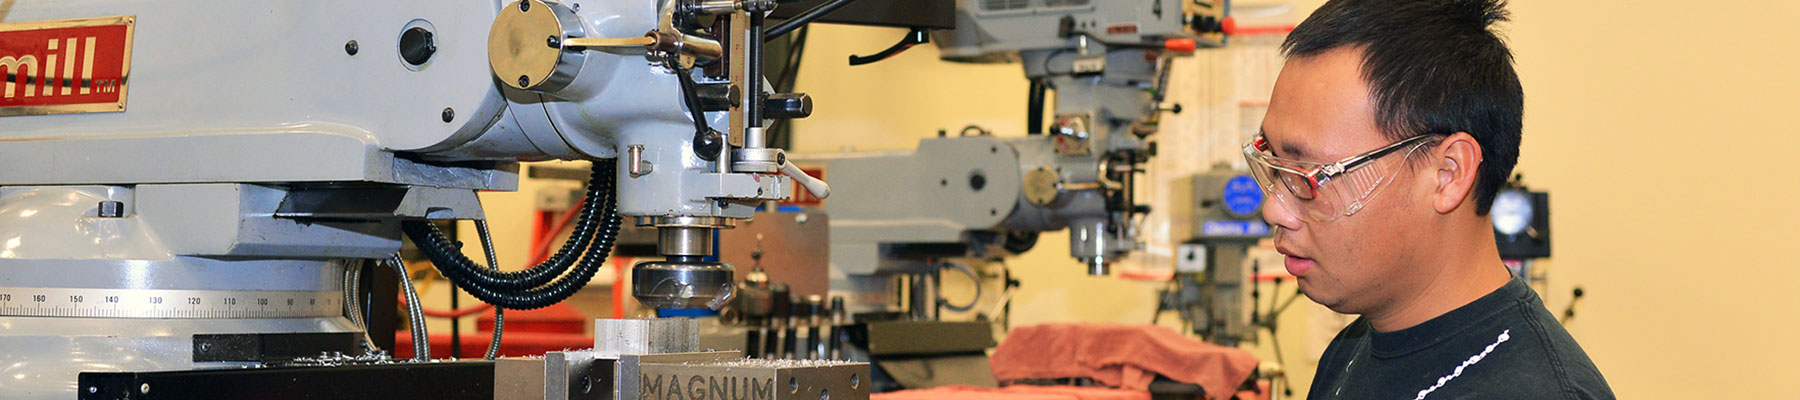 A Student Operating a Manufacturing Machine